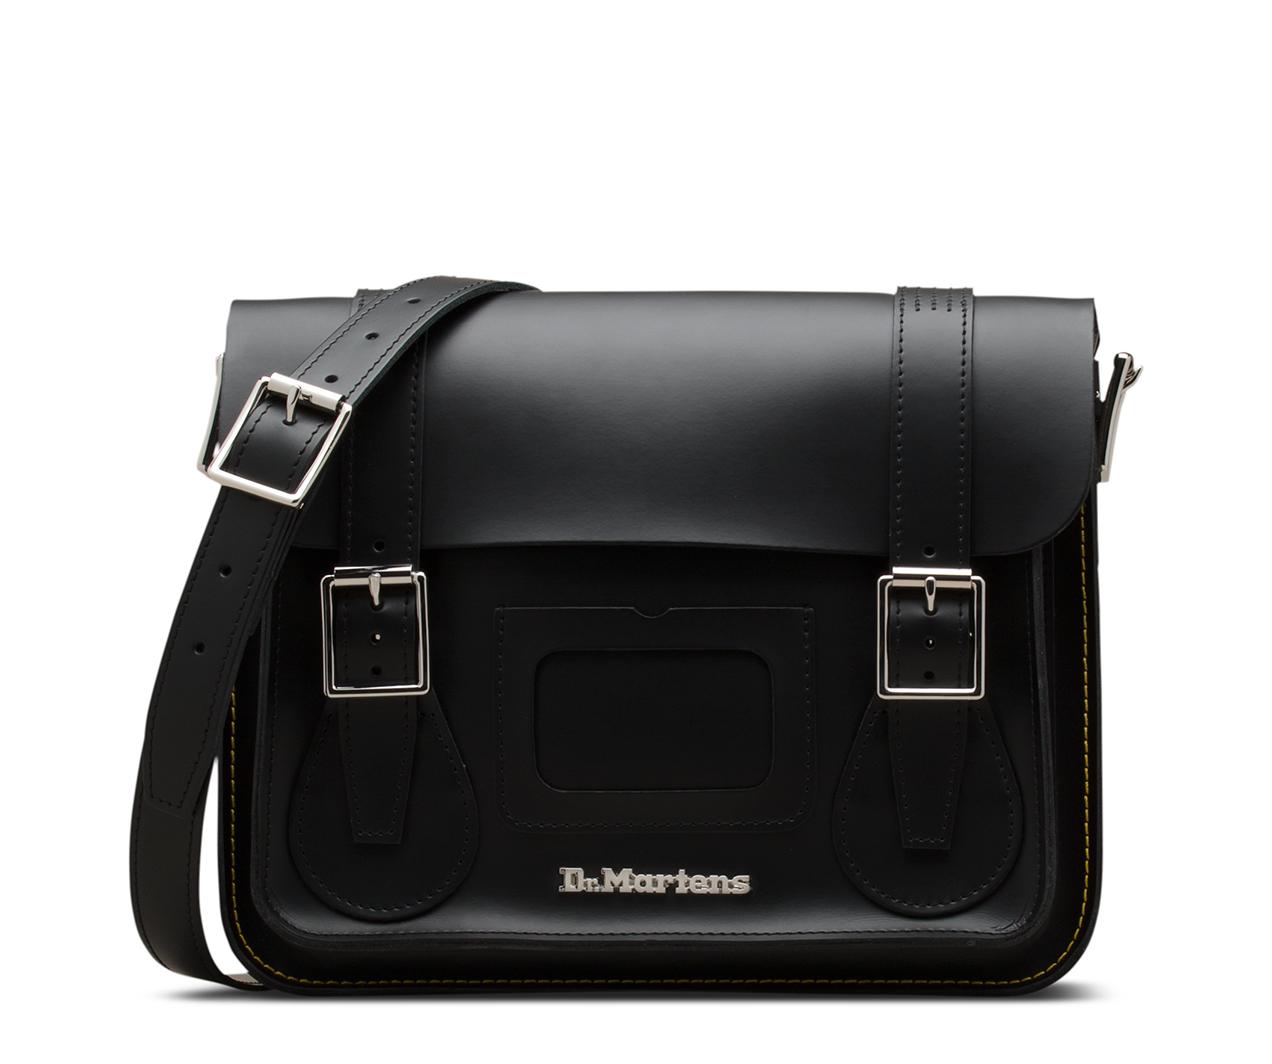 4a99db735 13 inch LEATHER SATCHEL | Bags & Satchels | Dr. Martens Official Site